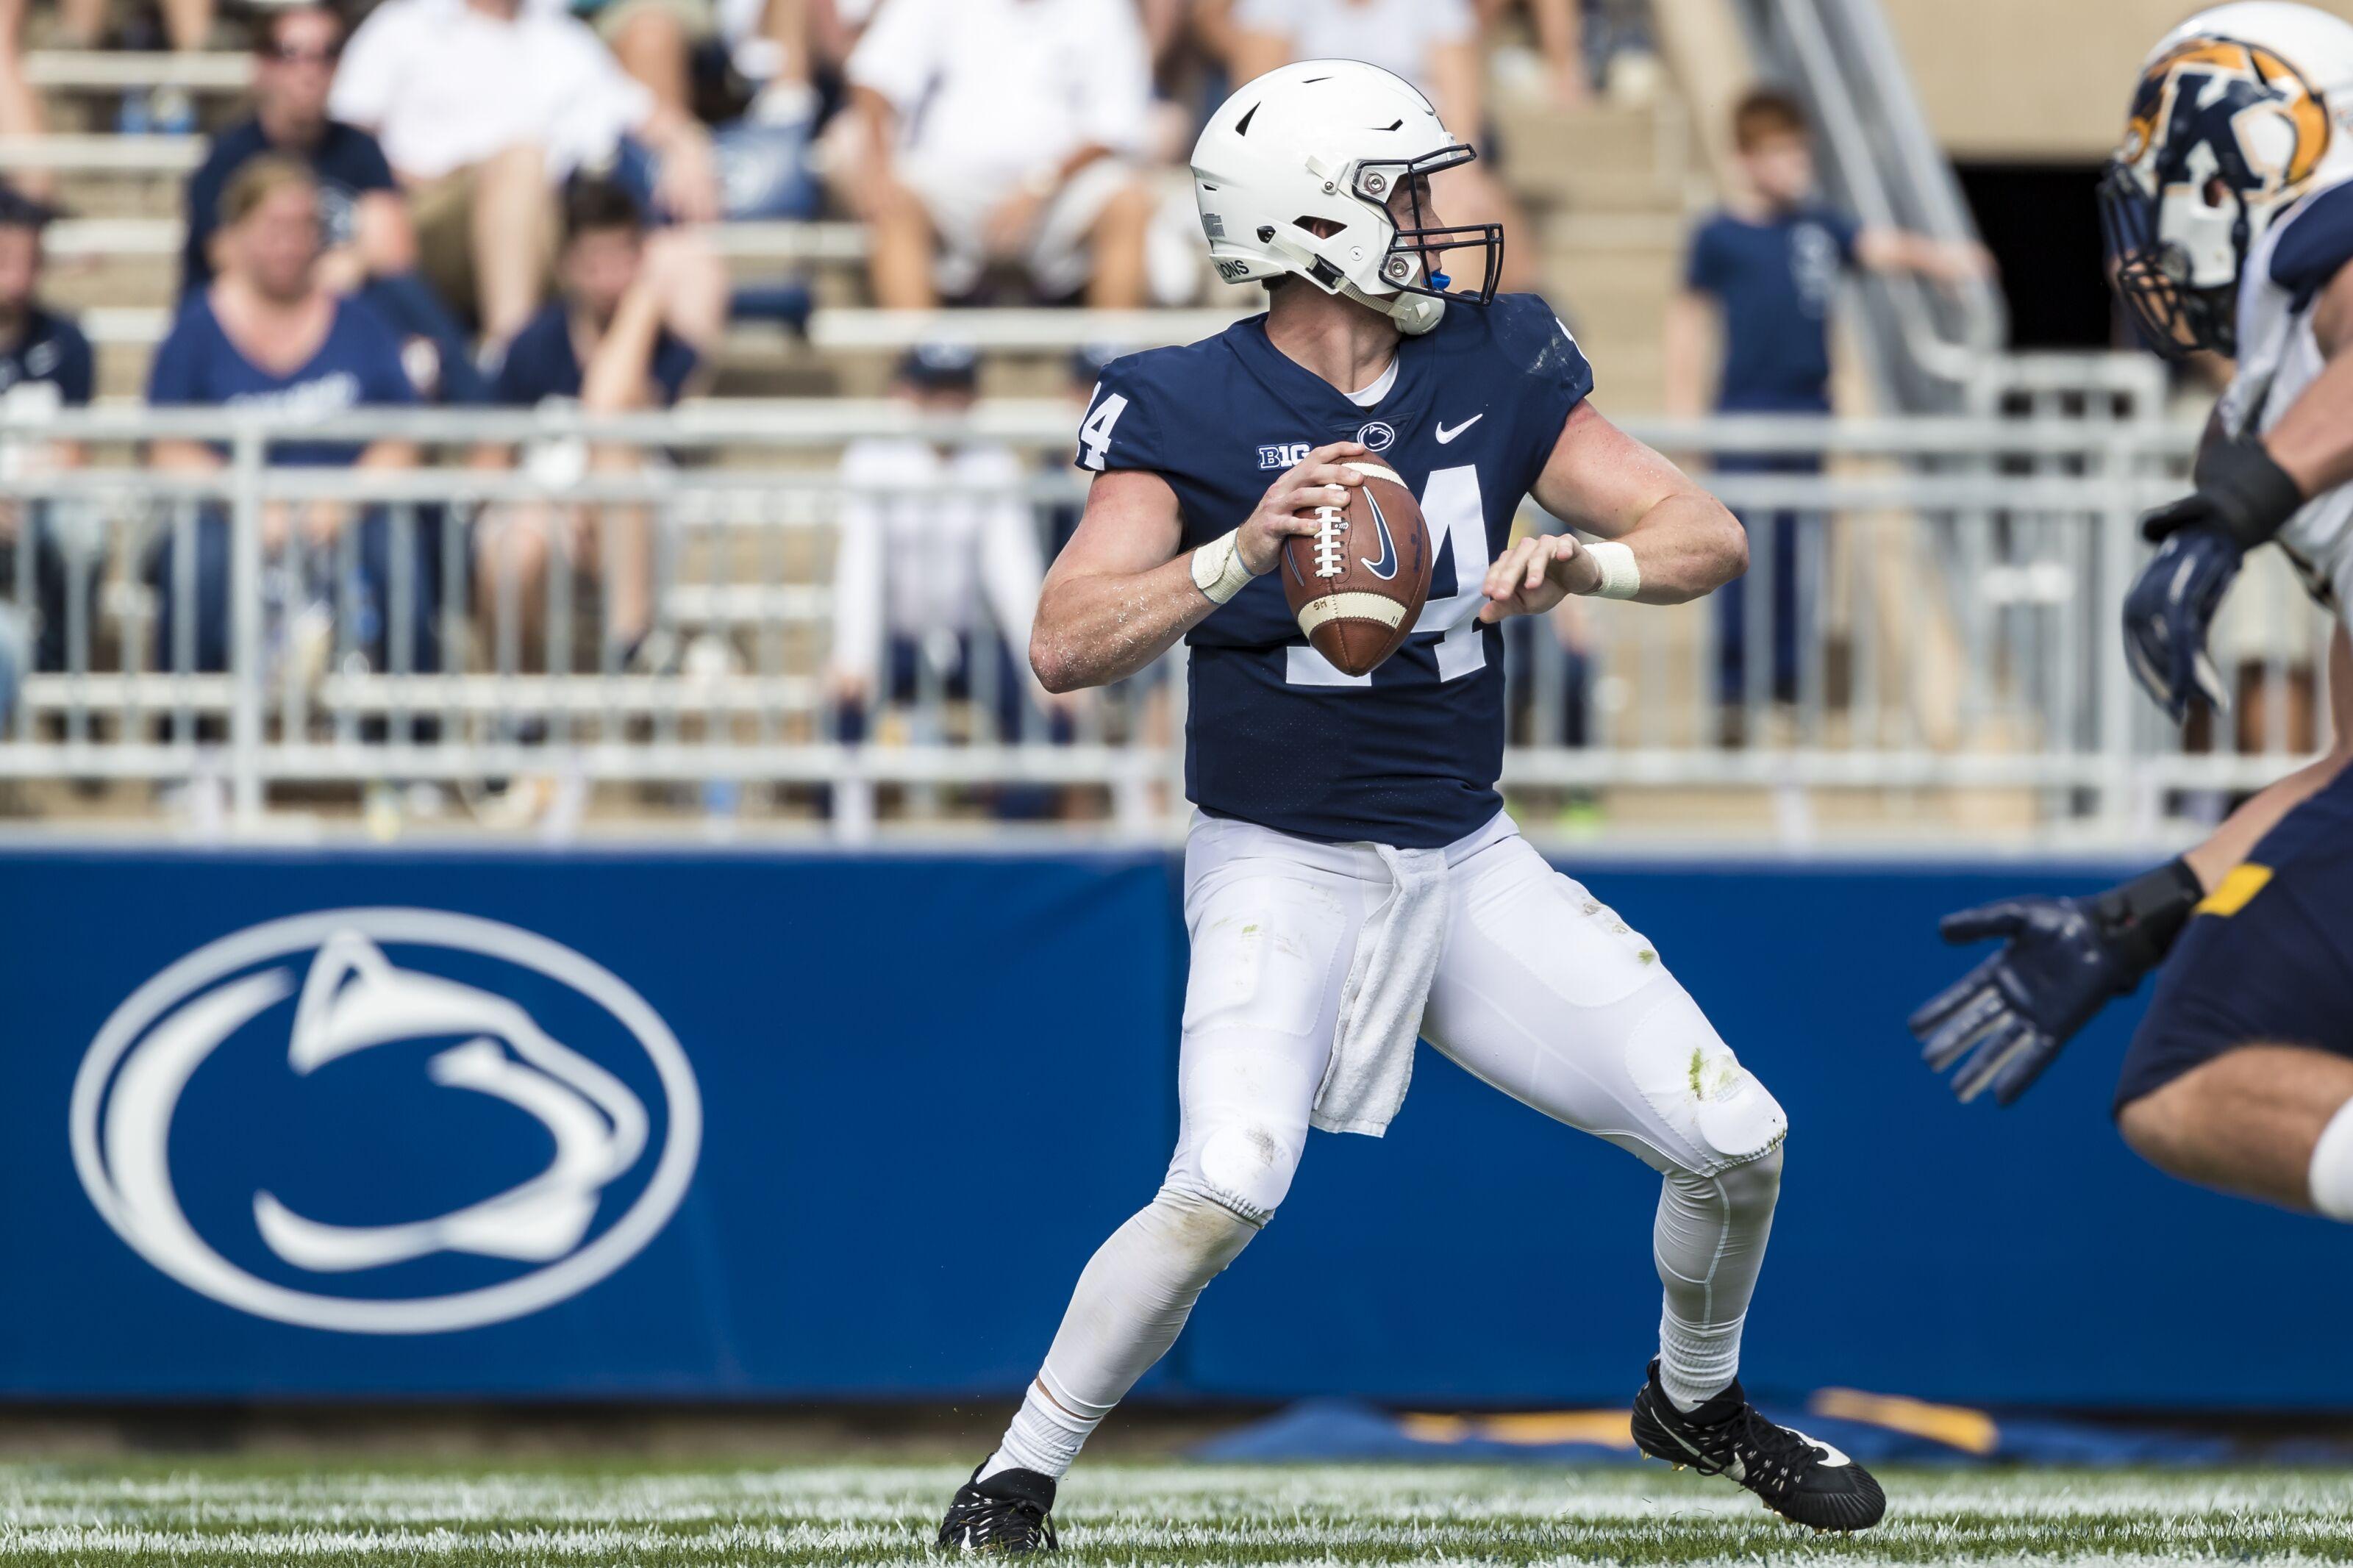 Penn State football: We should